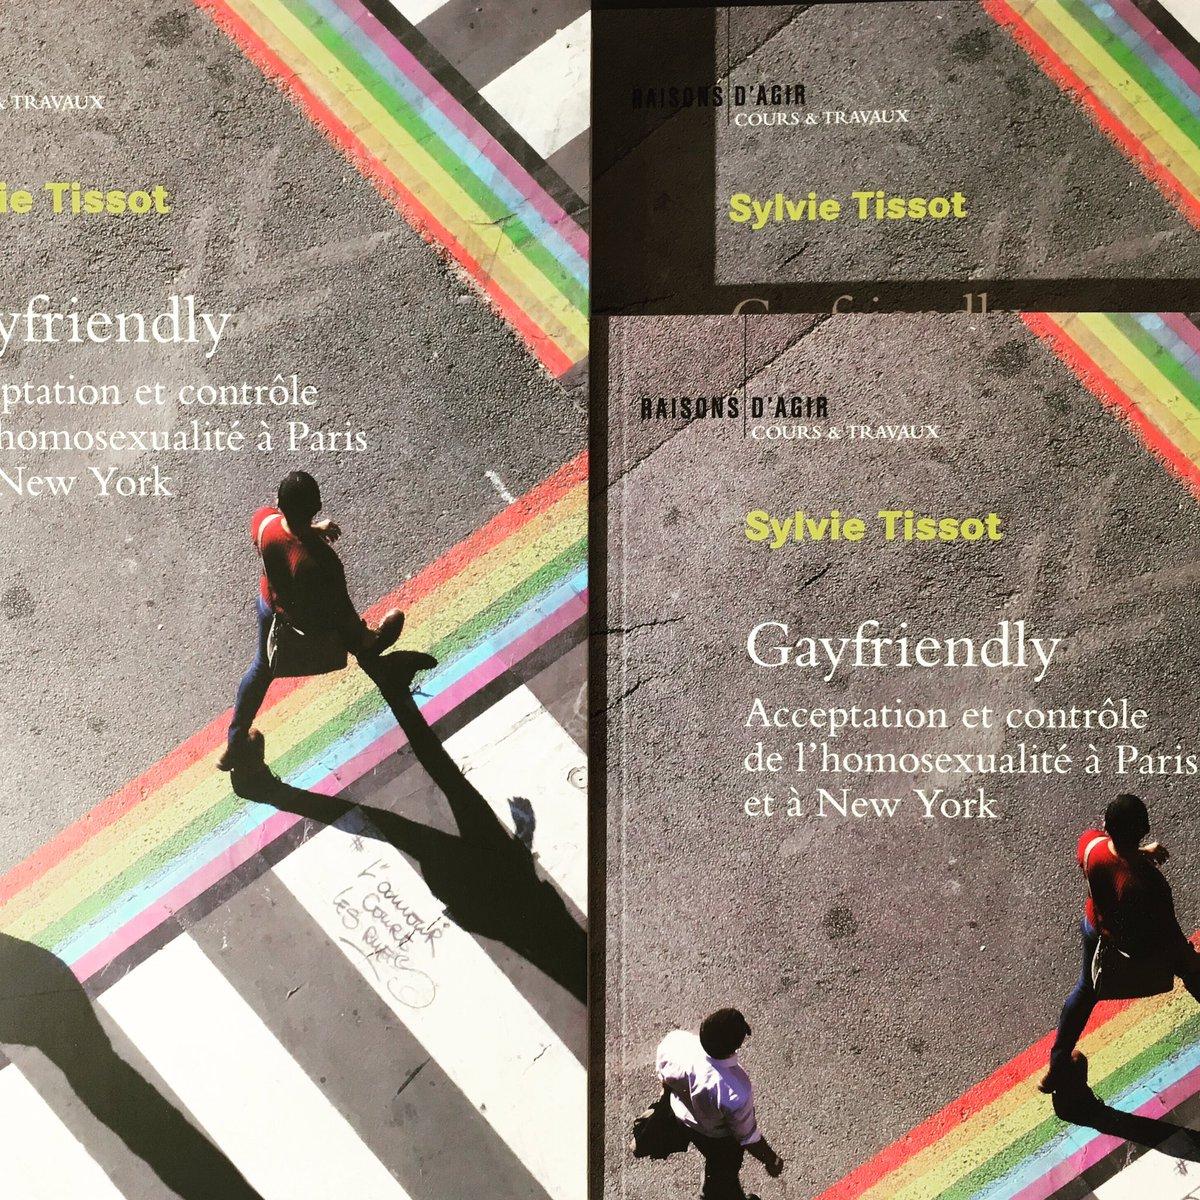 Gay rencontres Alexandrie Egypte